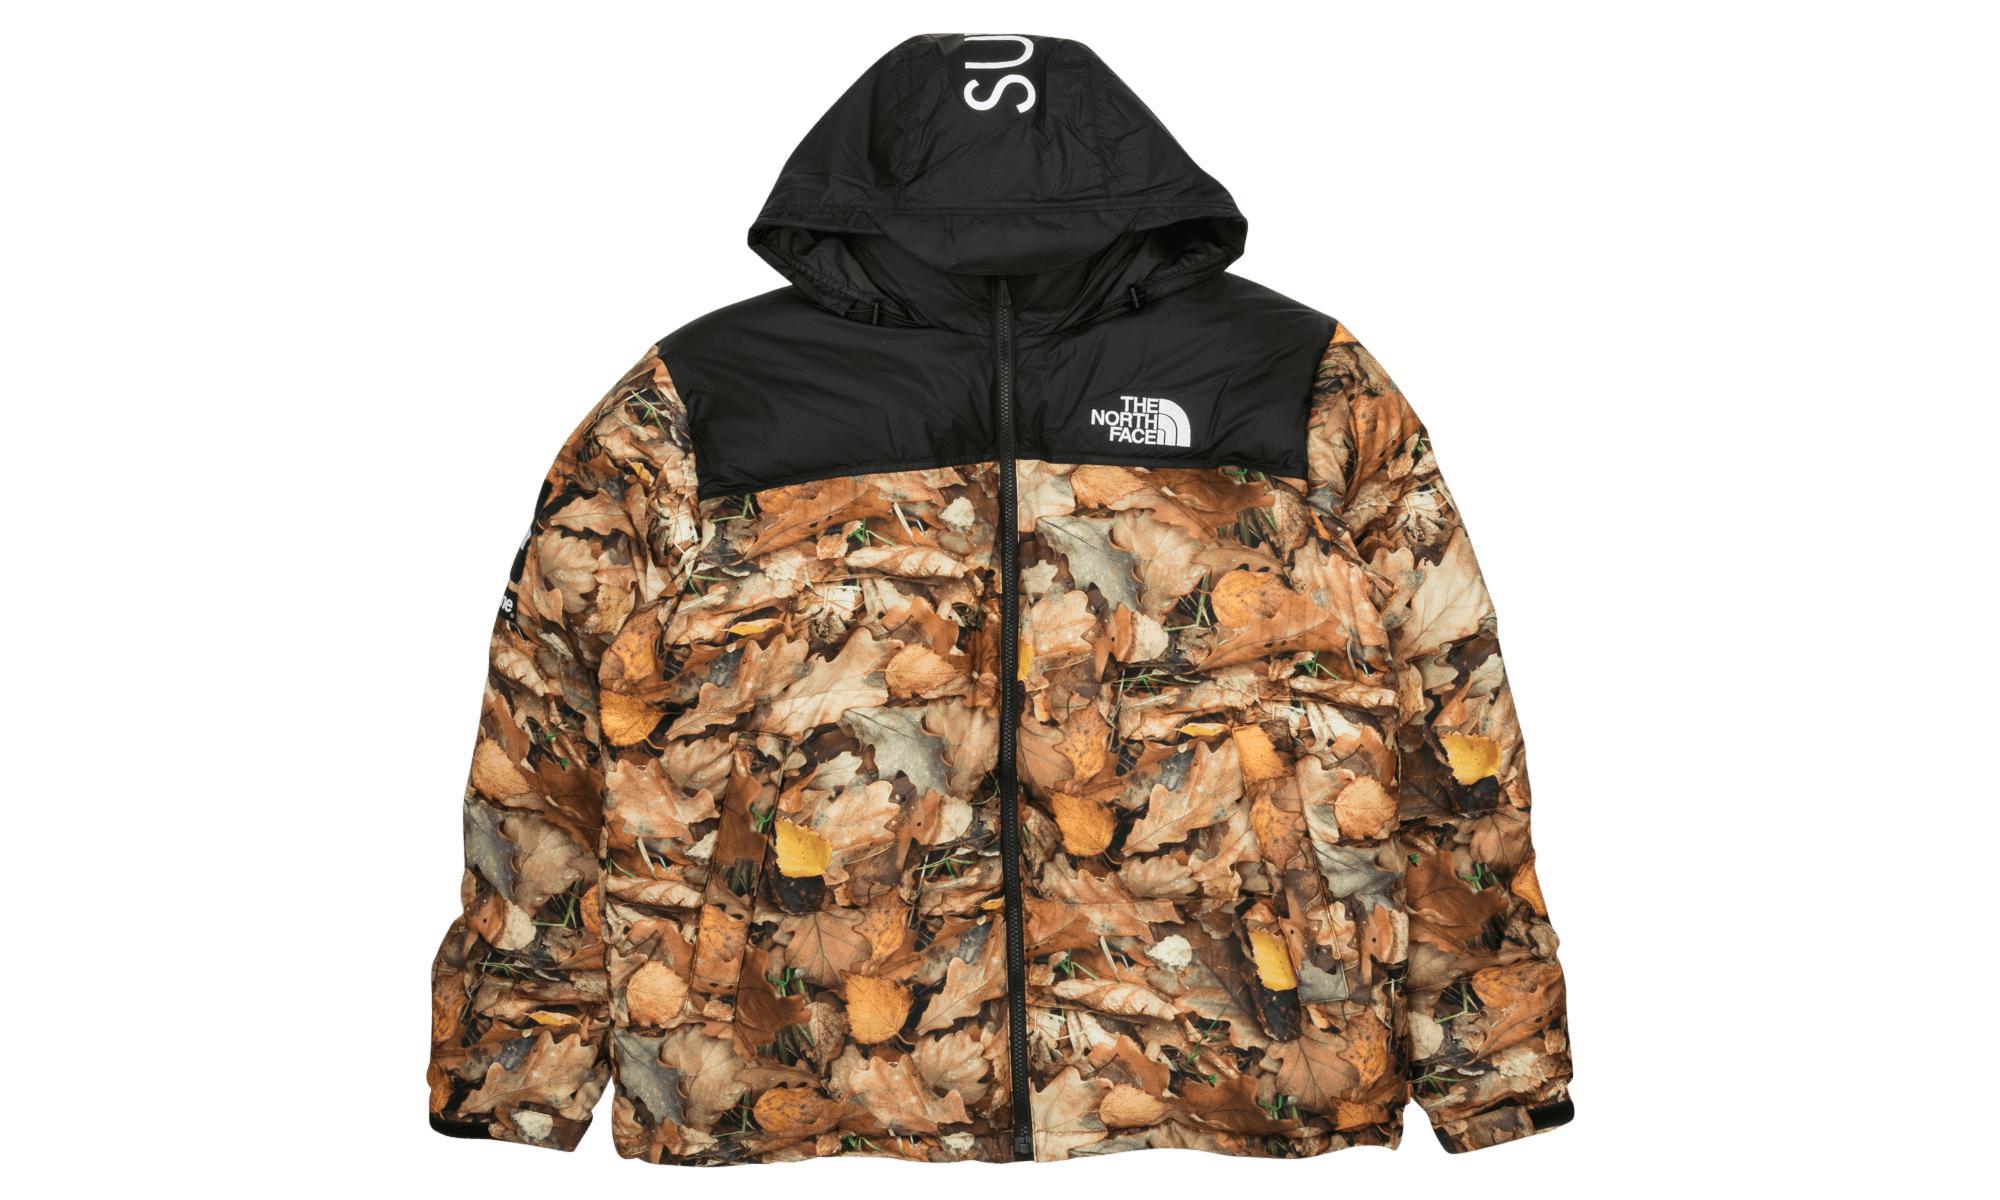 1c3e7478f9 Lyst - Supreme The North Face Nuptse Jacket for Men